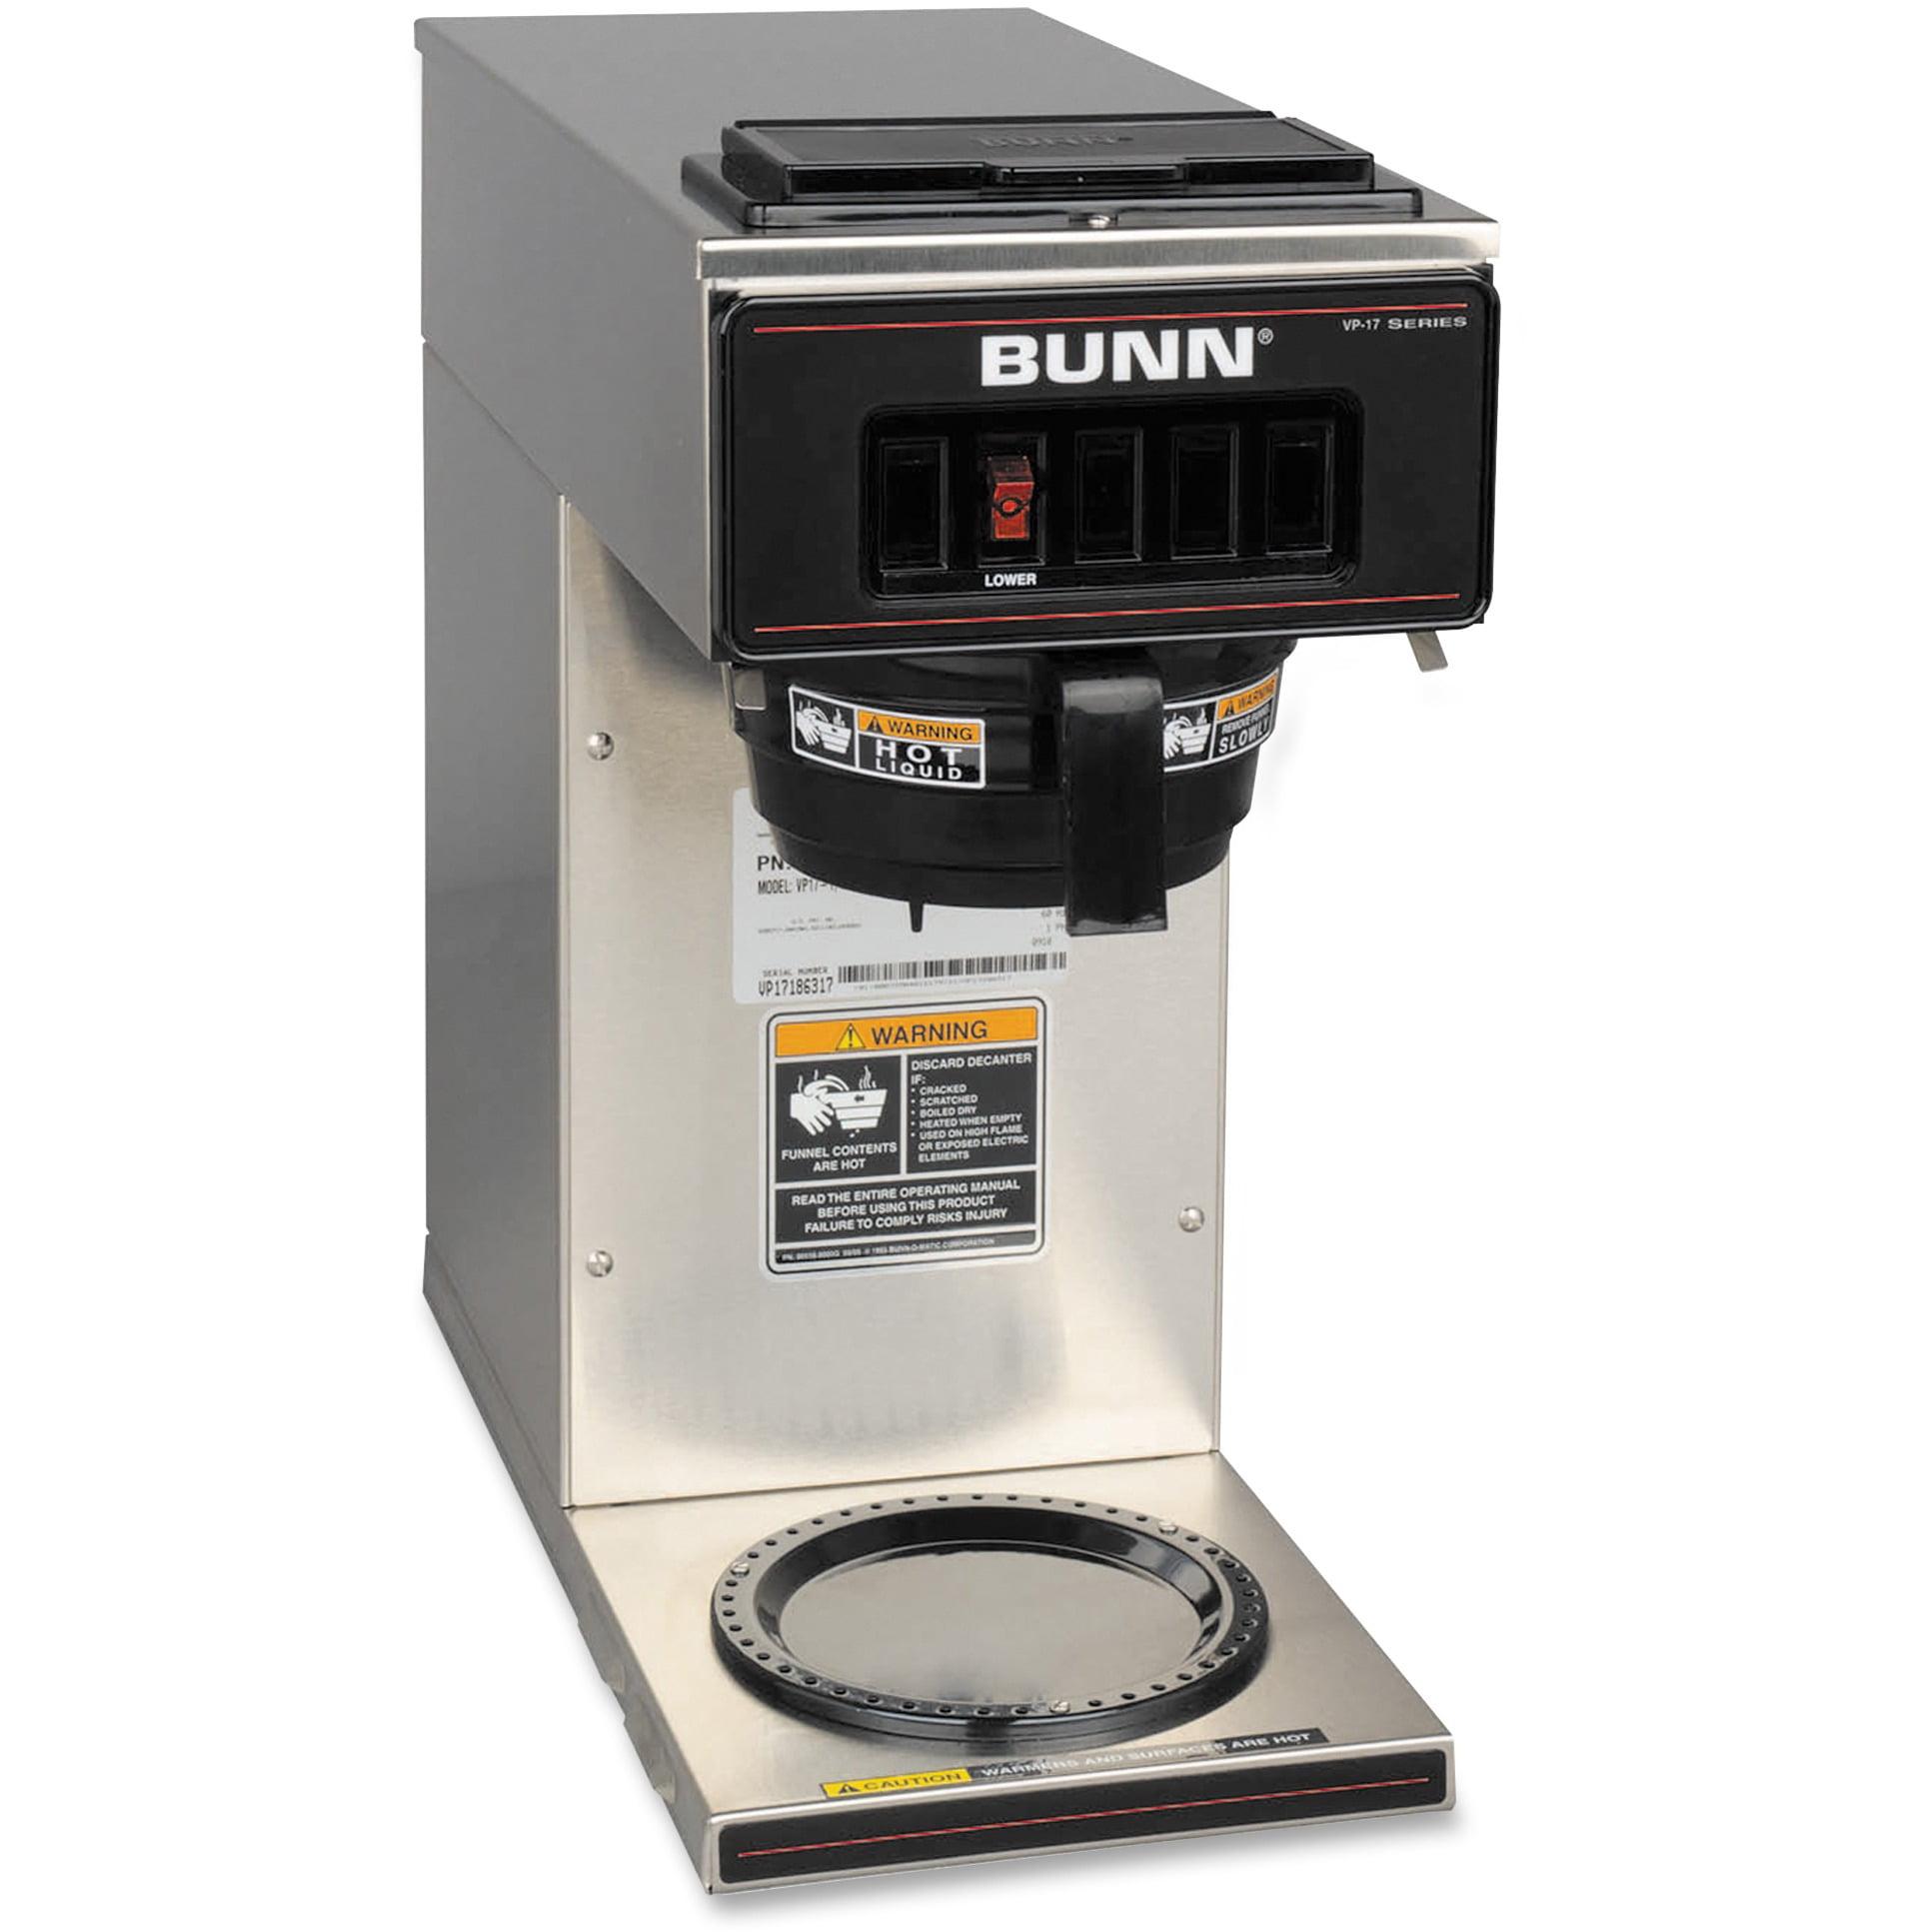 BUNN VP17-1 Coffee Brewer, Stainless Steel, Black Funnel